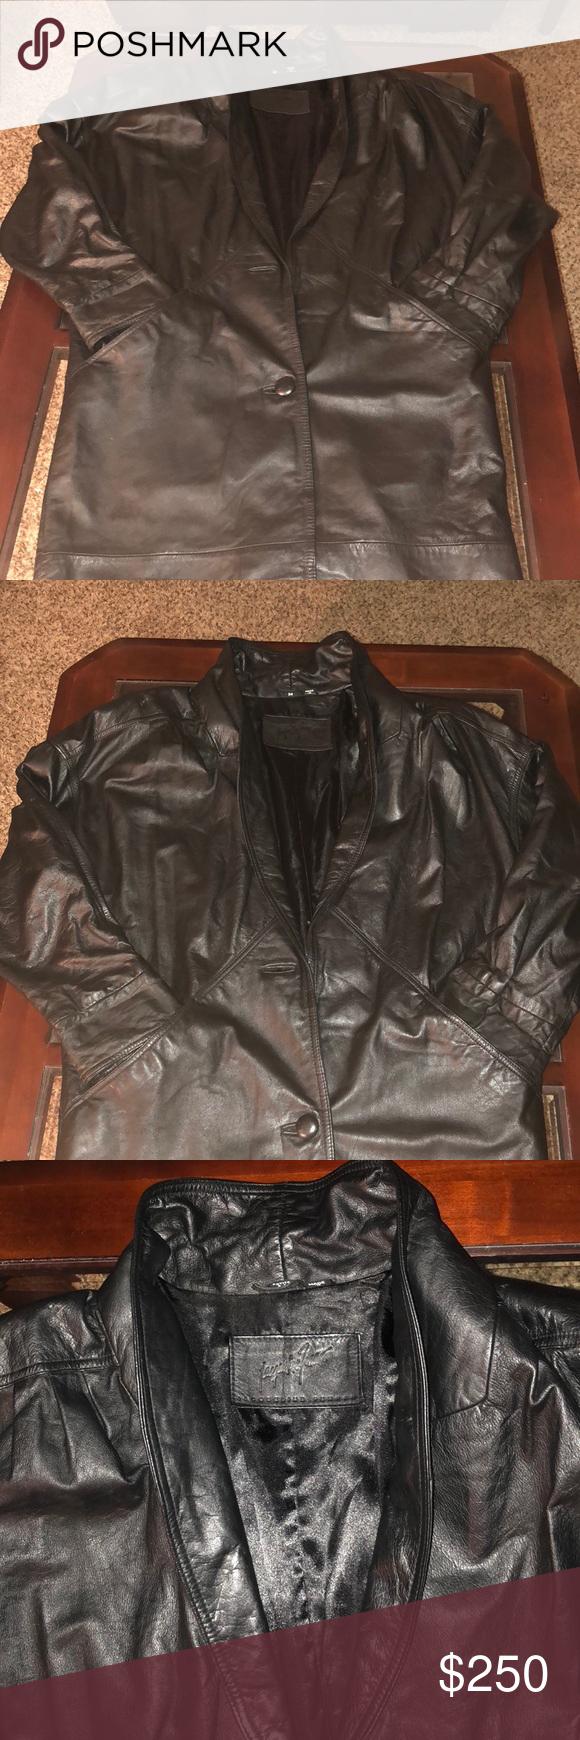 Unisex Genuine Leather Jf Ferrar Jacket Medium Unisex Genuine Leather Jf Ferrar Jacket Beautiful Sleek Black 42 Long Medium Jackets Leather Genuine Leather